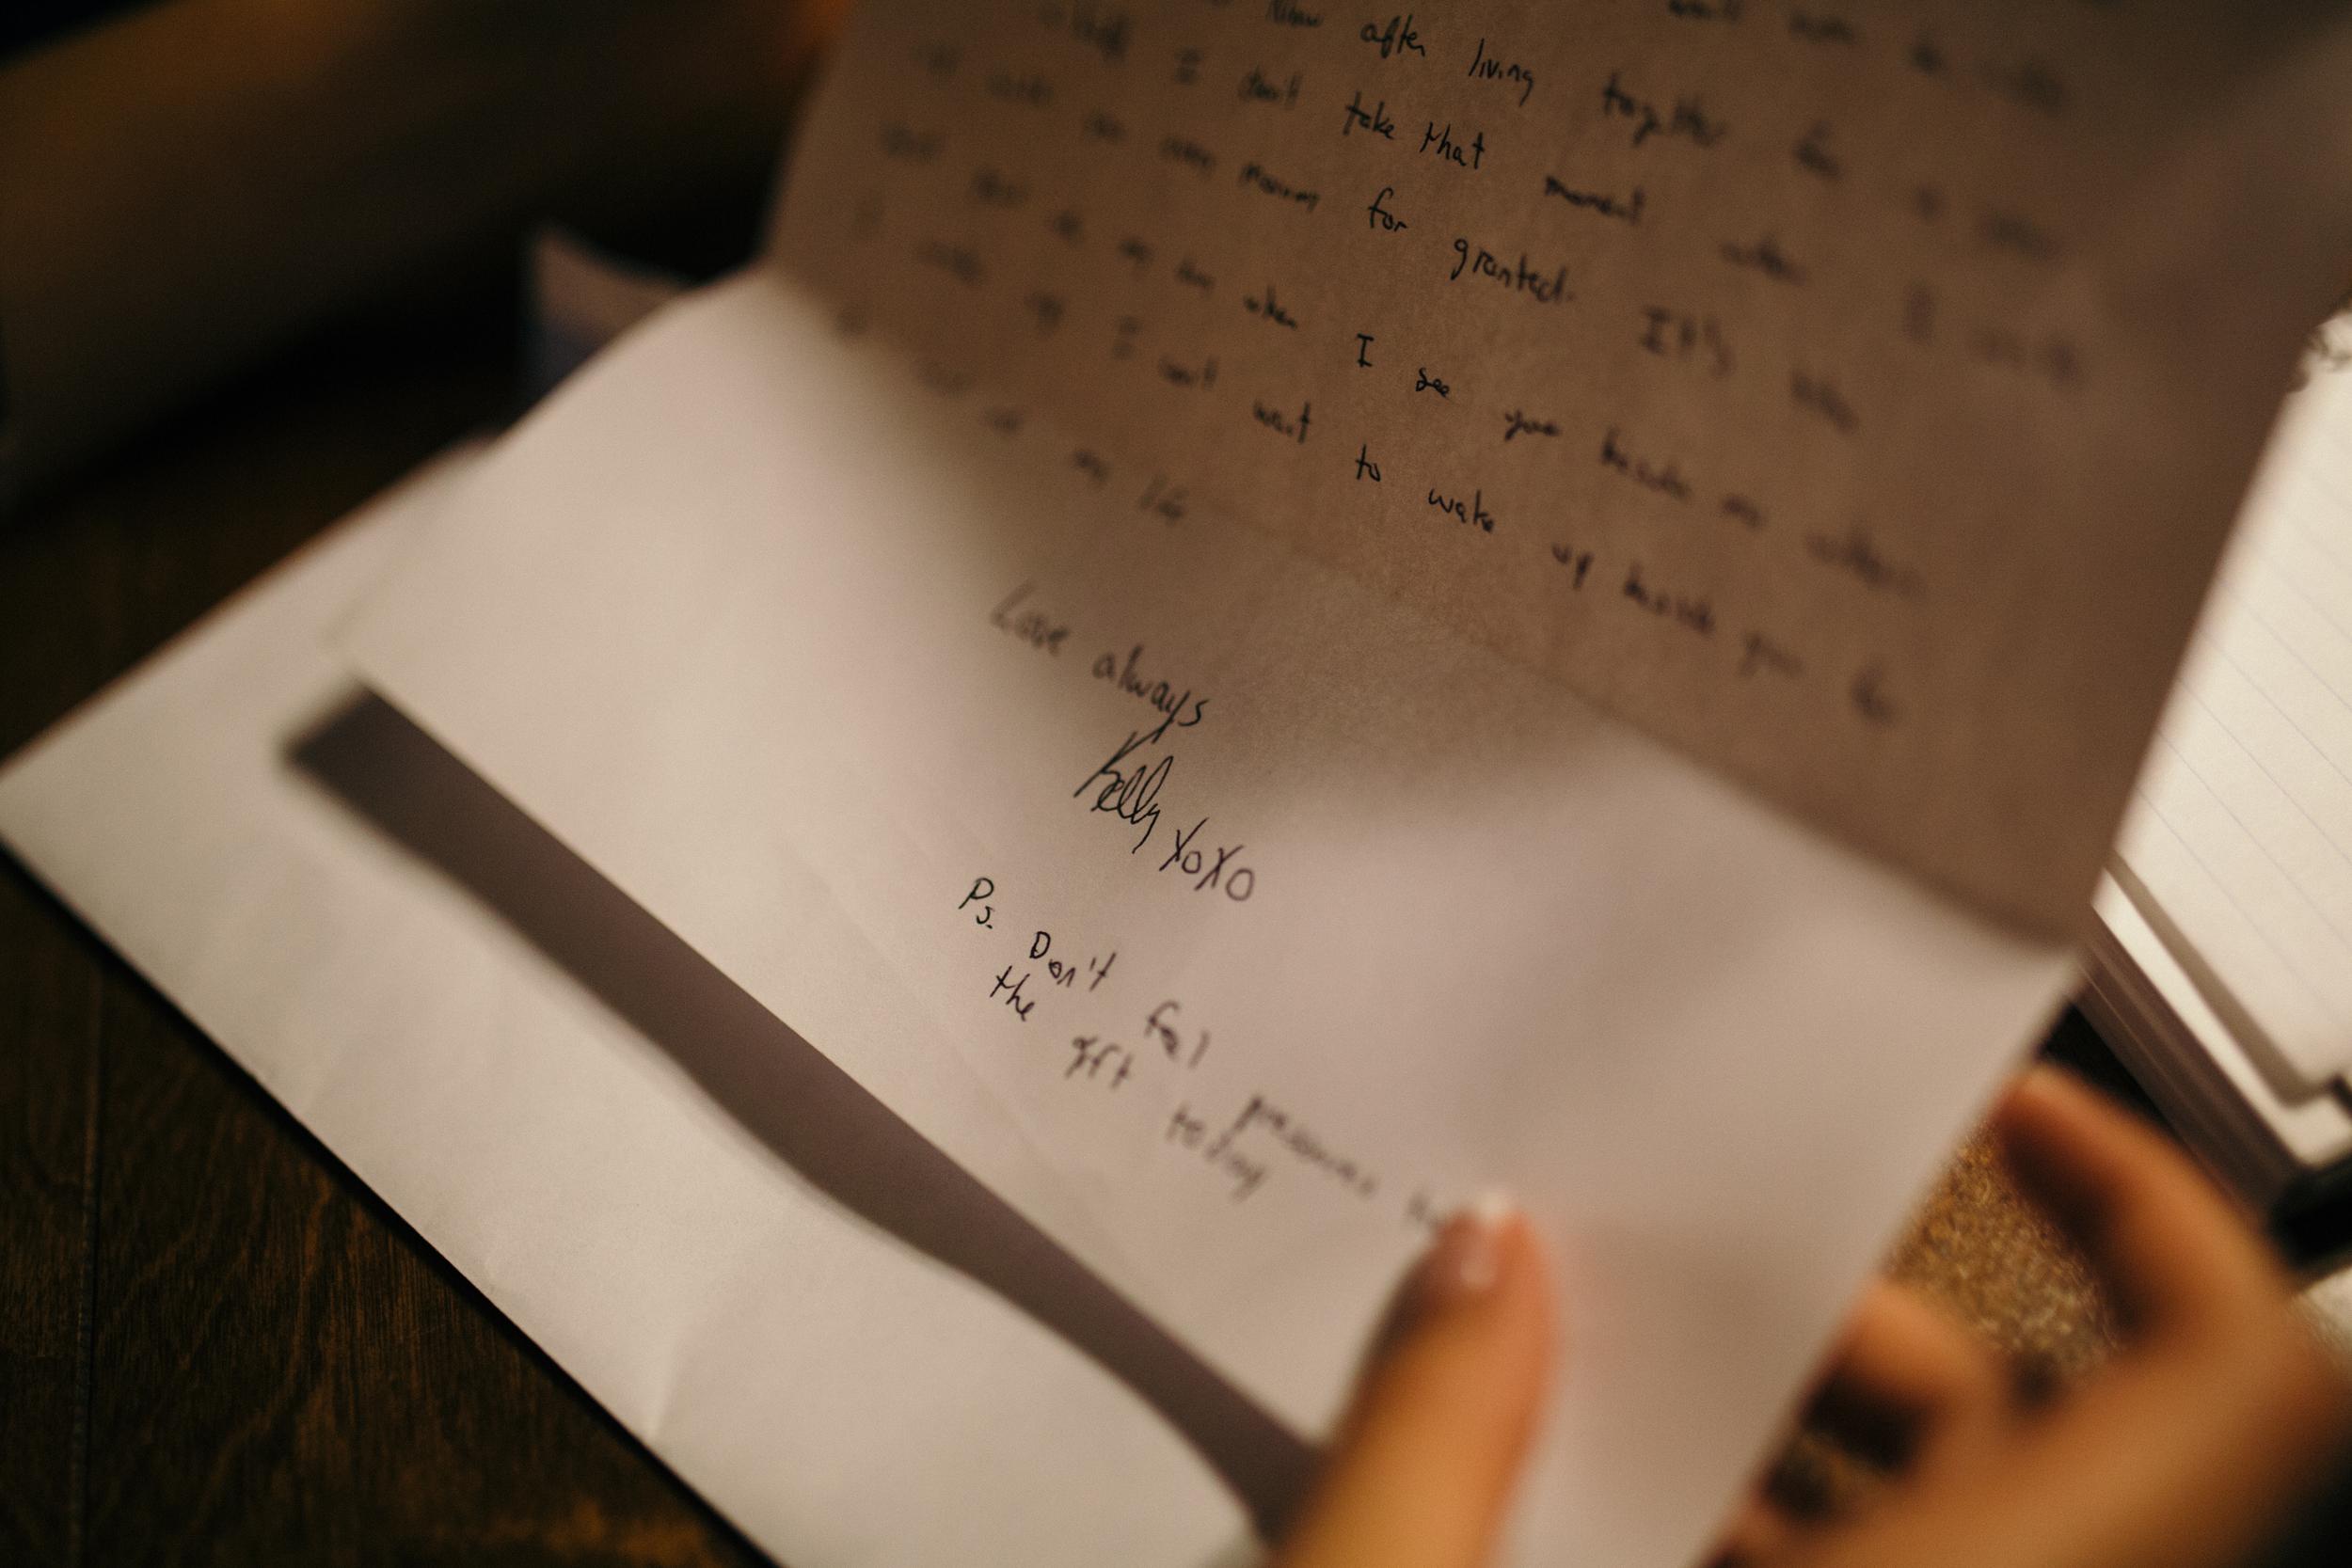 Wedding letter bride and groom vows Victoria destination wedding - Clear Lake Manitoba